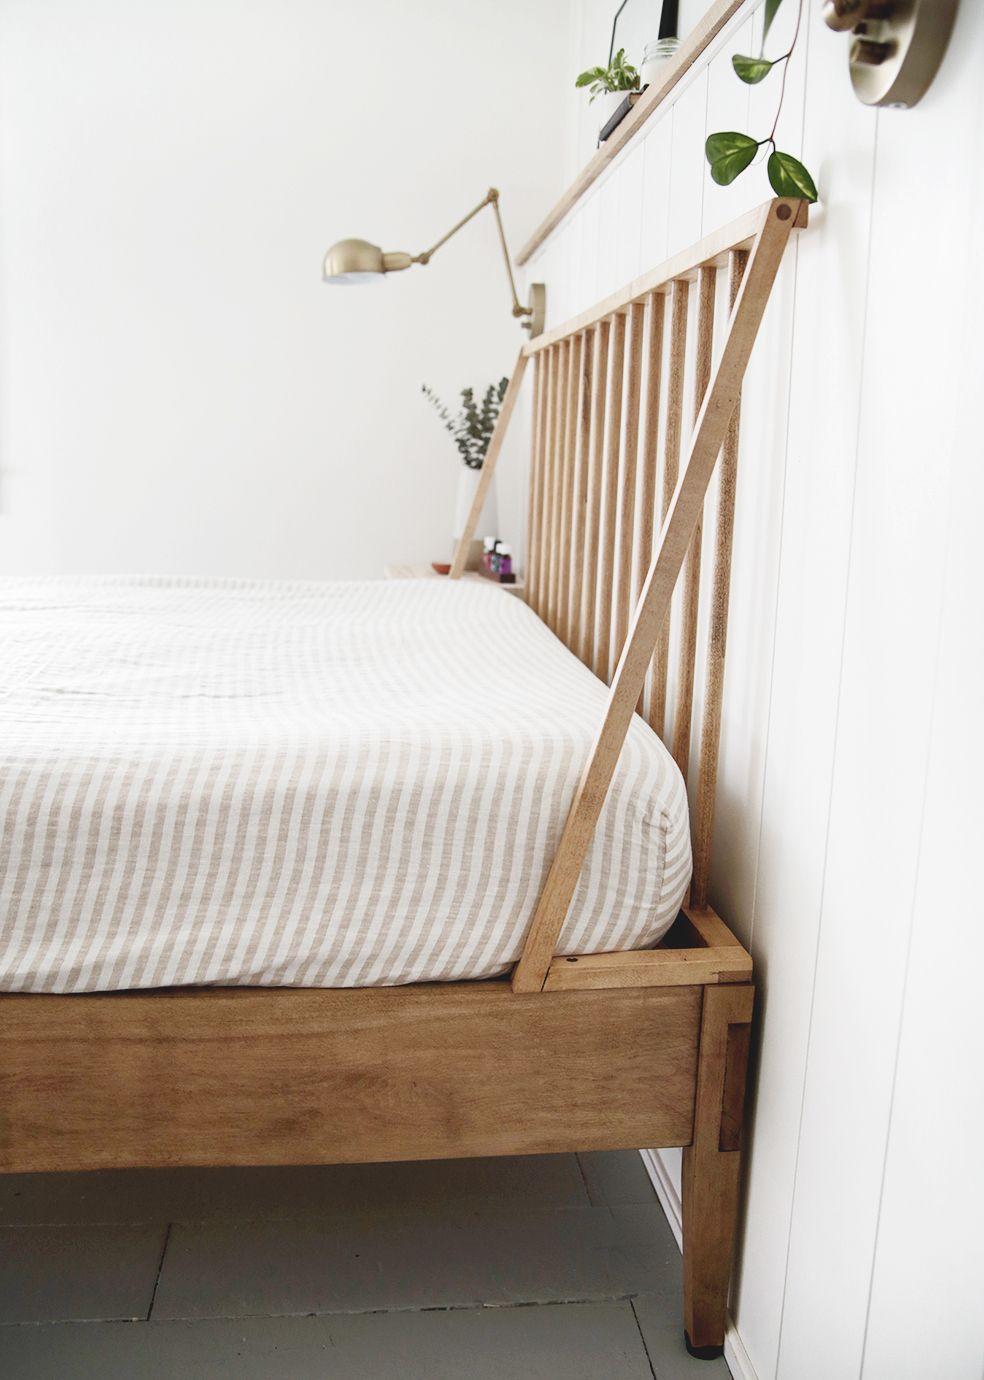 Diy dowel headboard in 2020 diy bed headboard bed